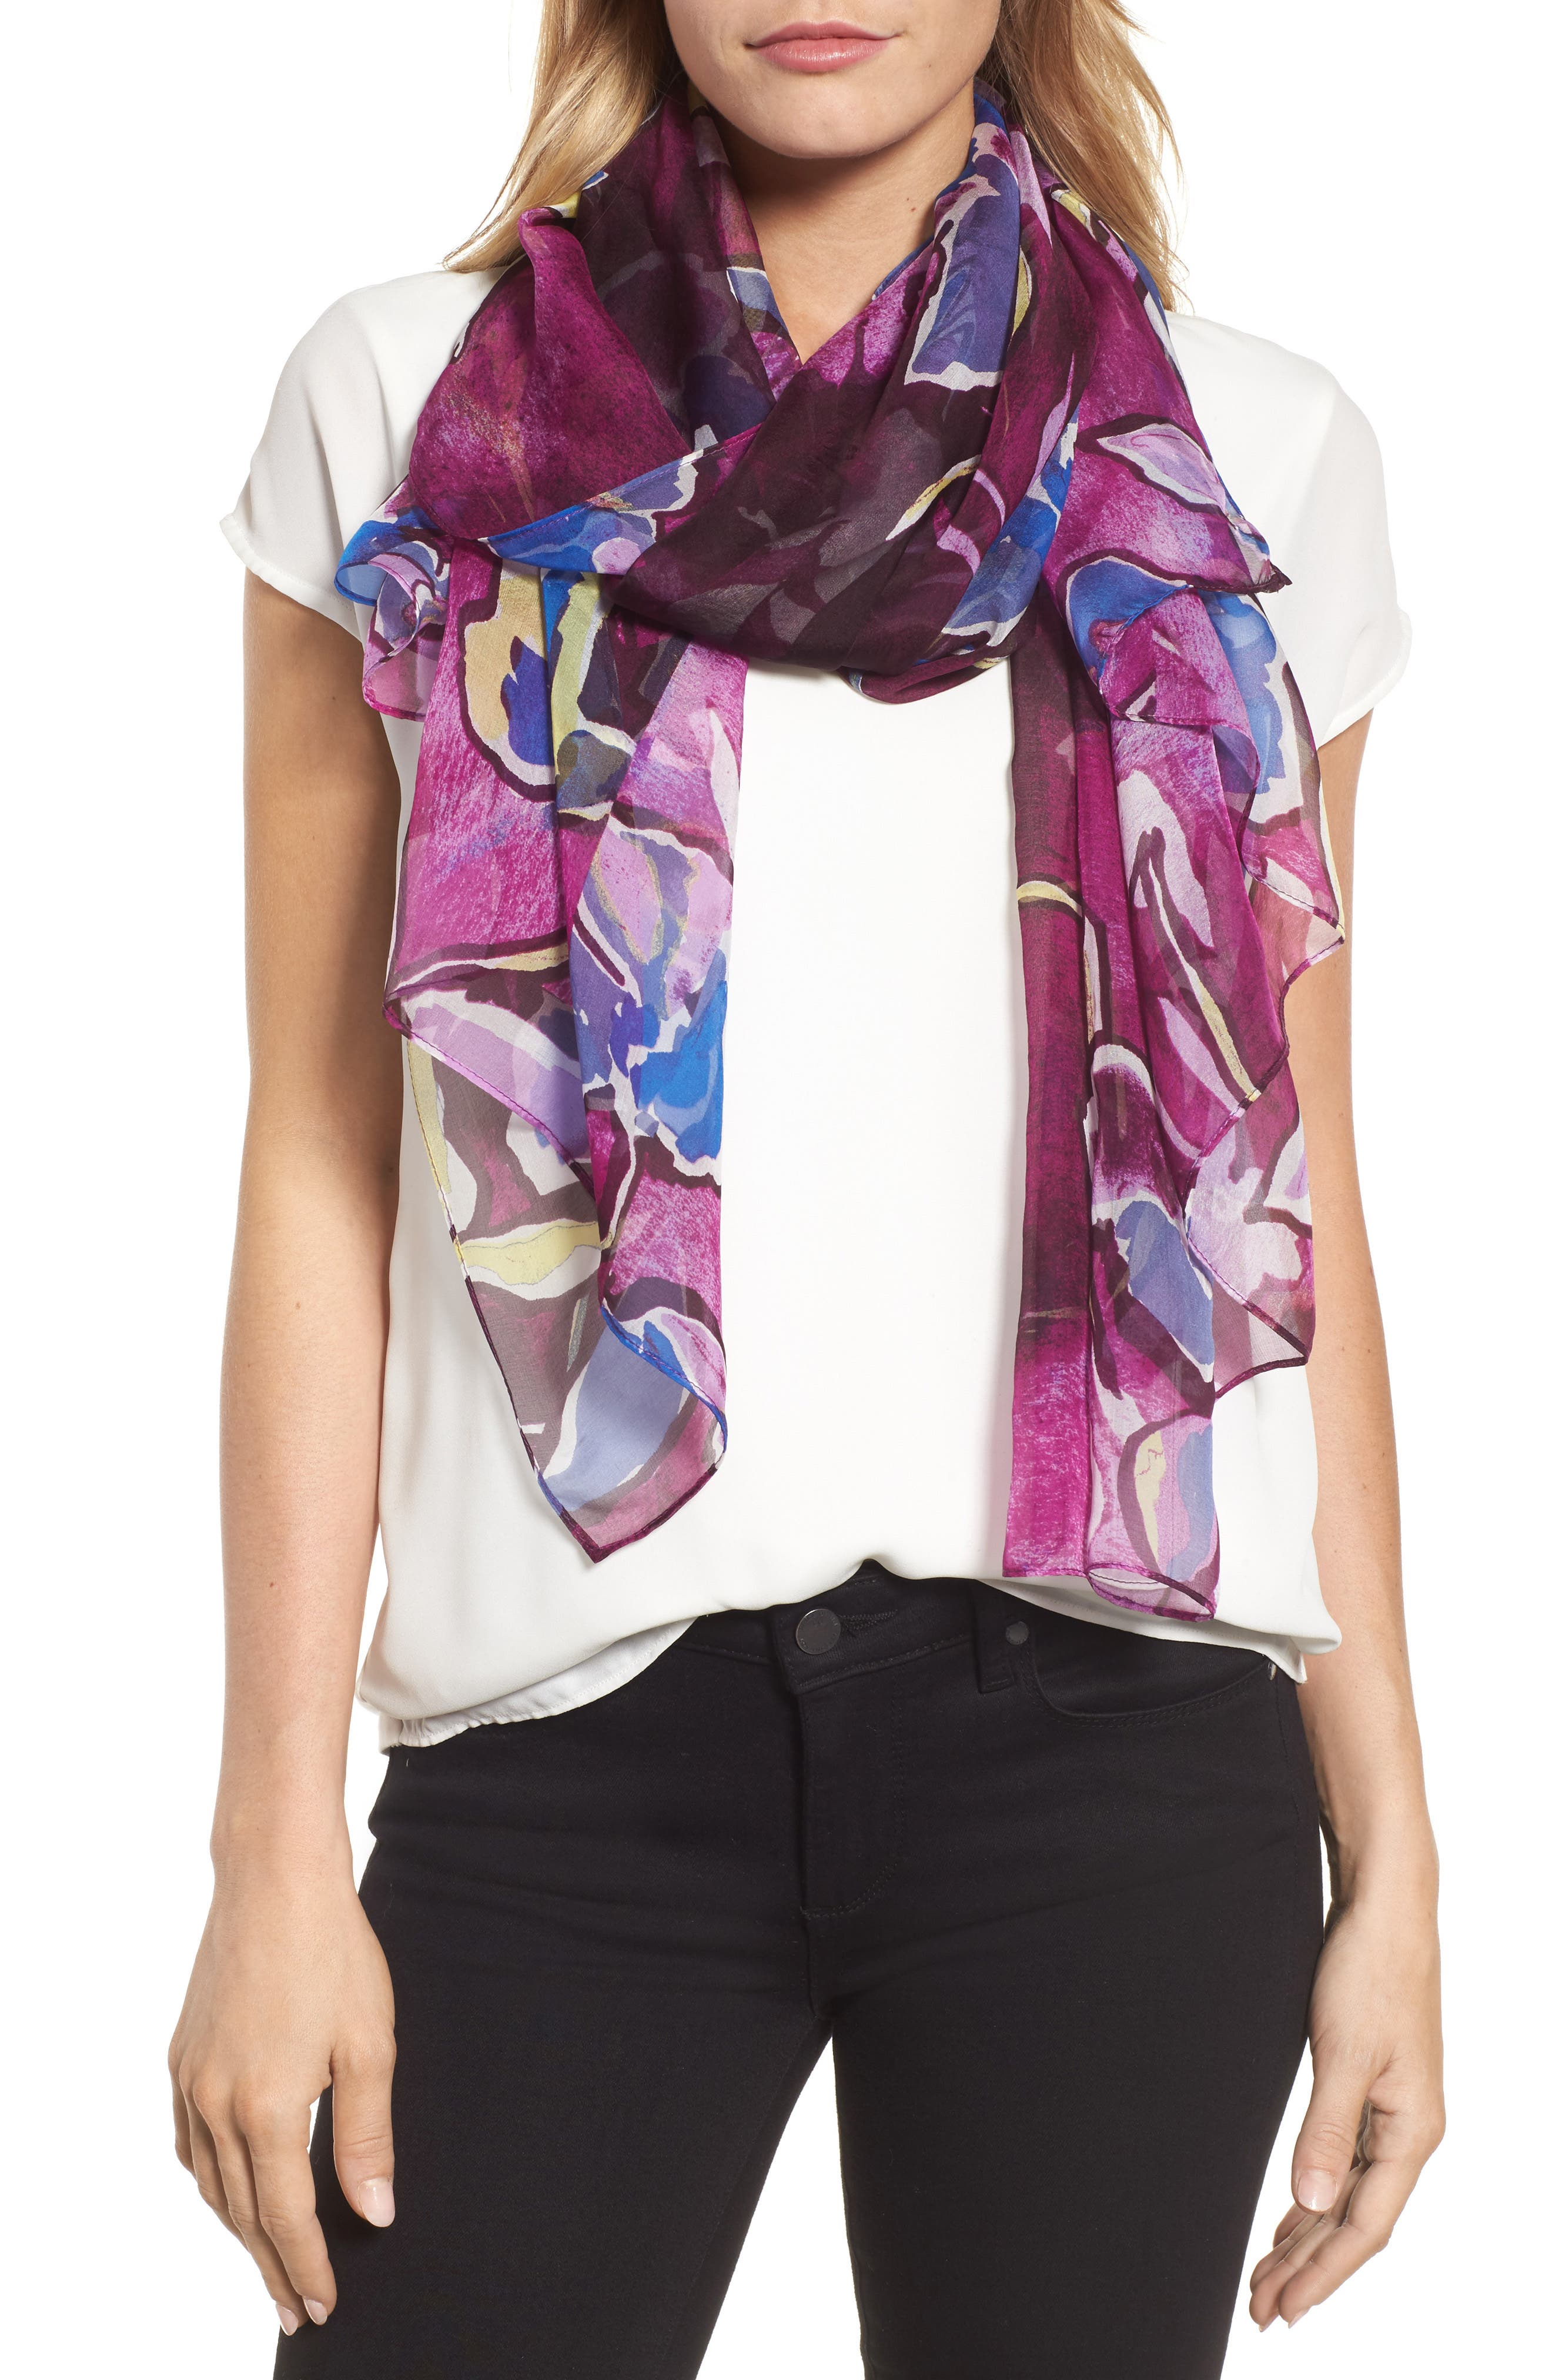 Silk Chiffon Oblong Scarf,                             Main thumbnail 1, color,                             Purple Textured Blooms